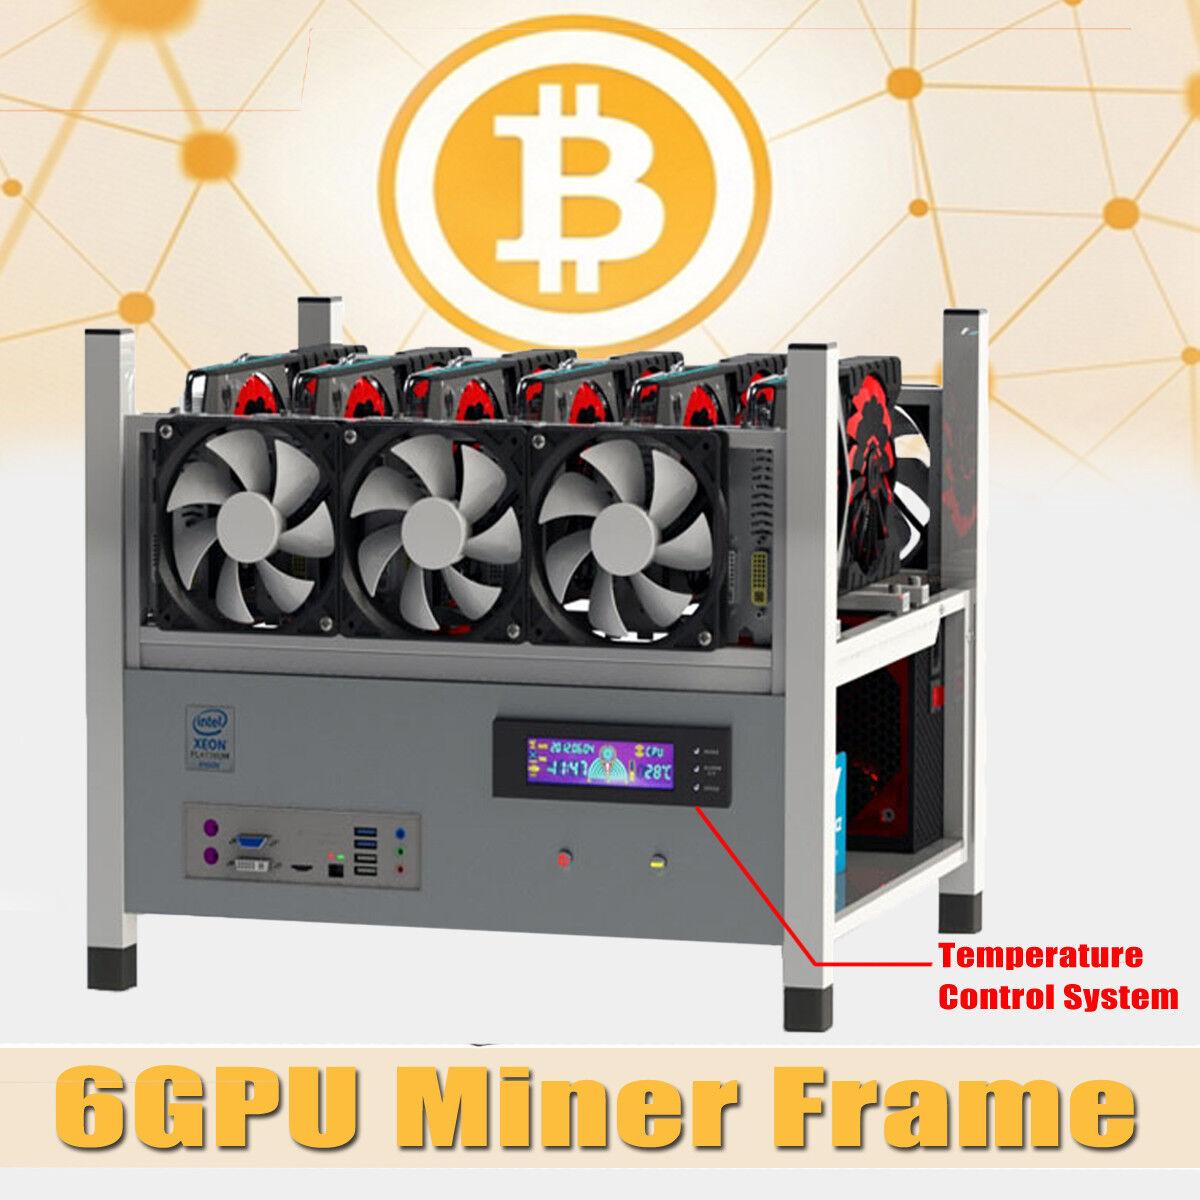 BX36 6GPU Miner Frame 6 Fans Open Air Frame Coins Minning Case BTC ETH Ethereum